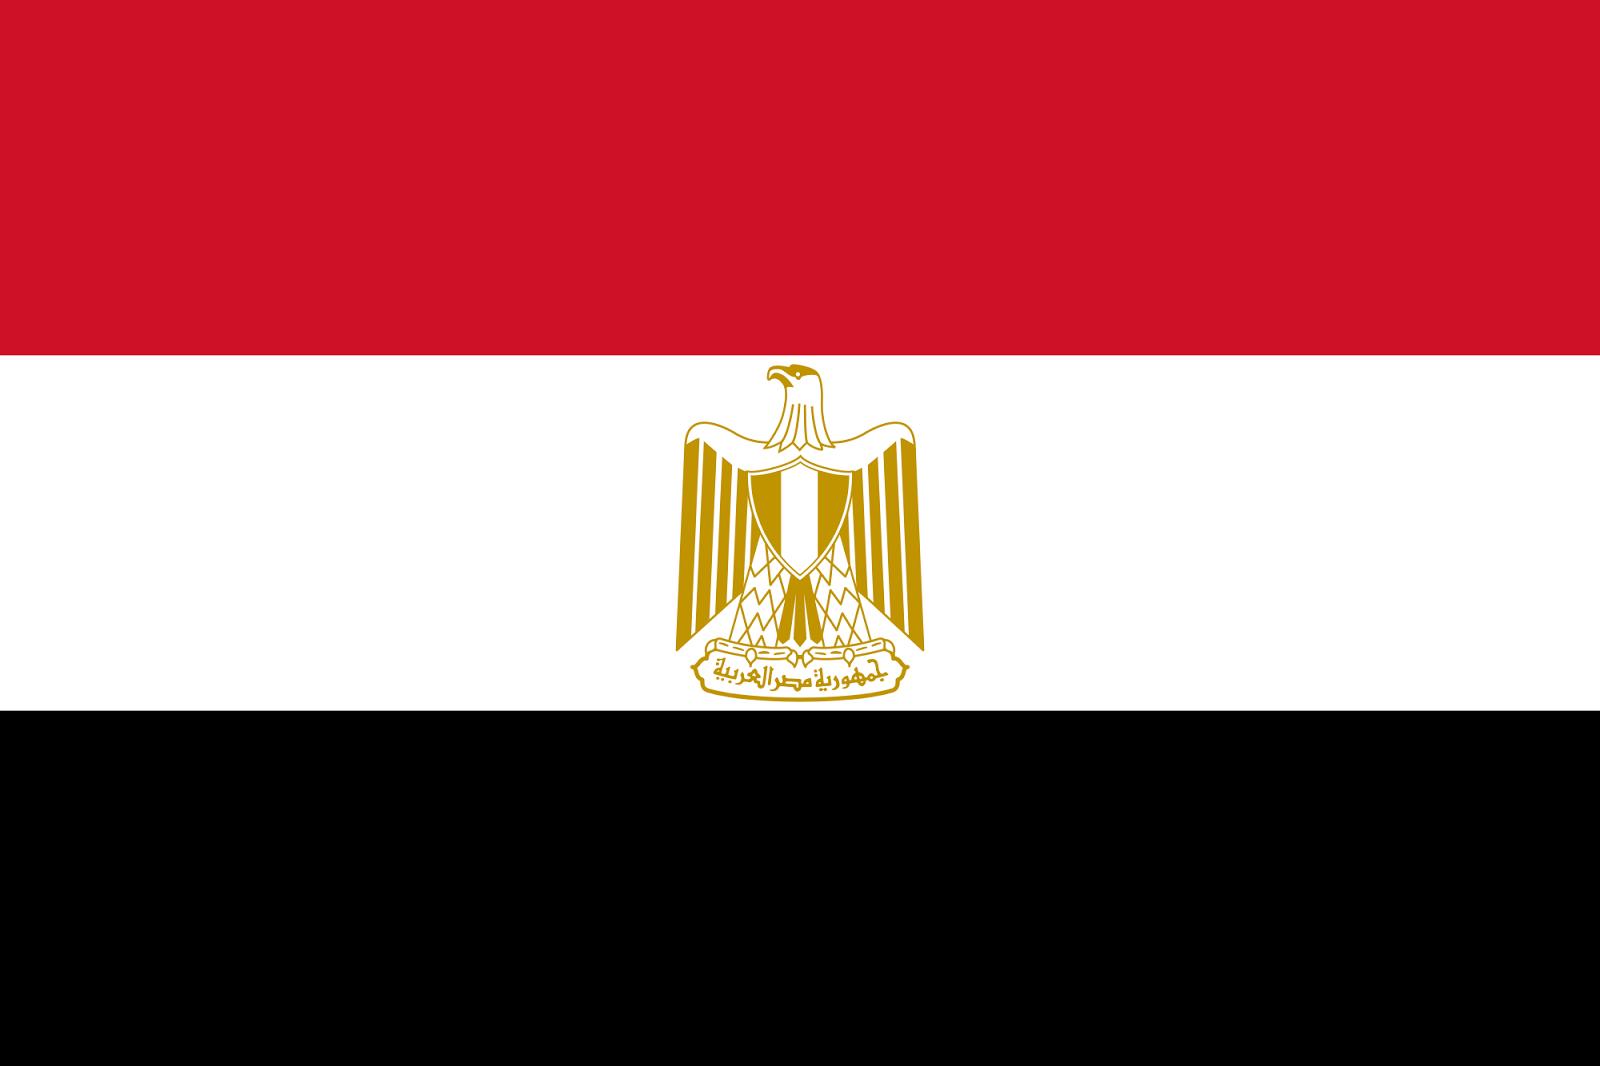 http://carbrandsincurrentproduction.blogspot.com.es/search/label/Egypt